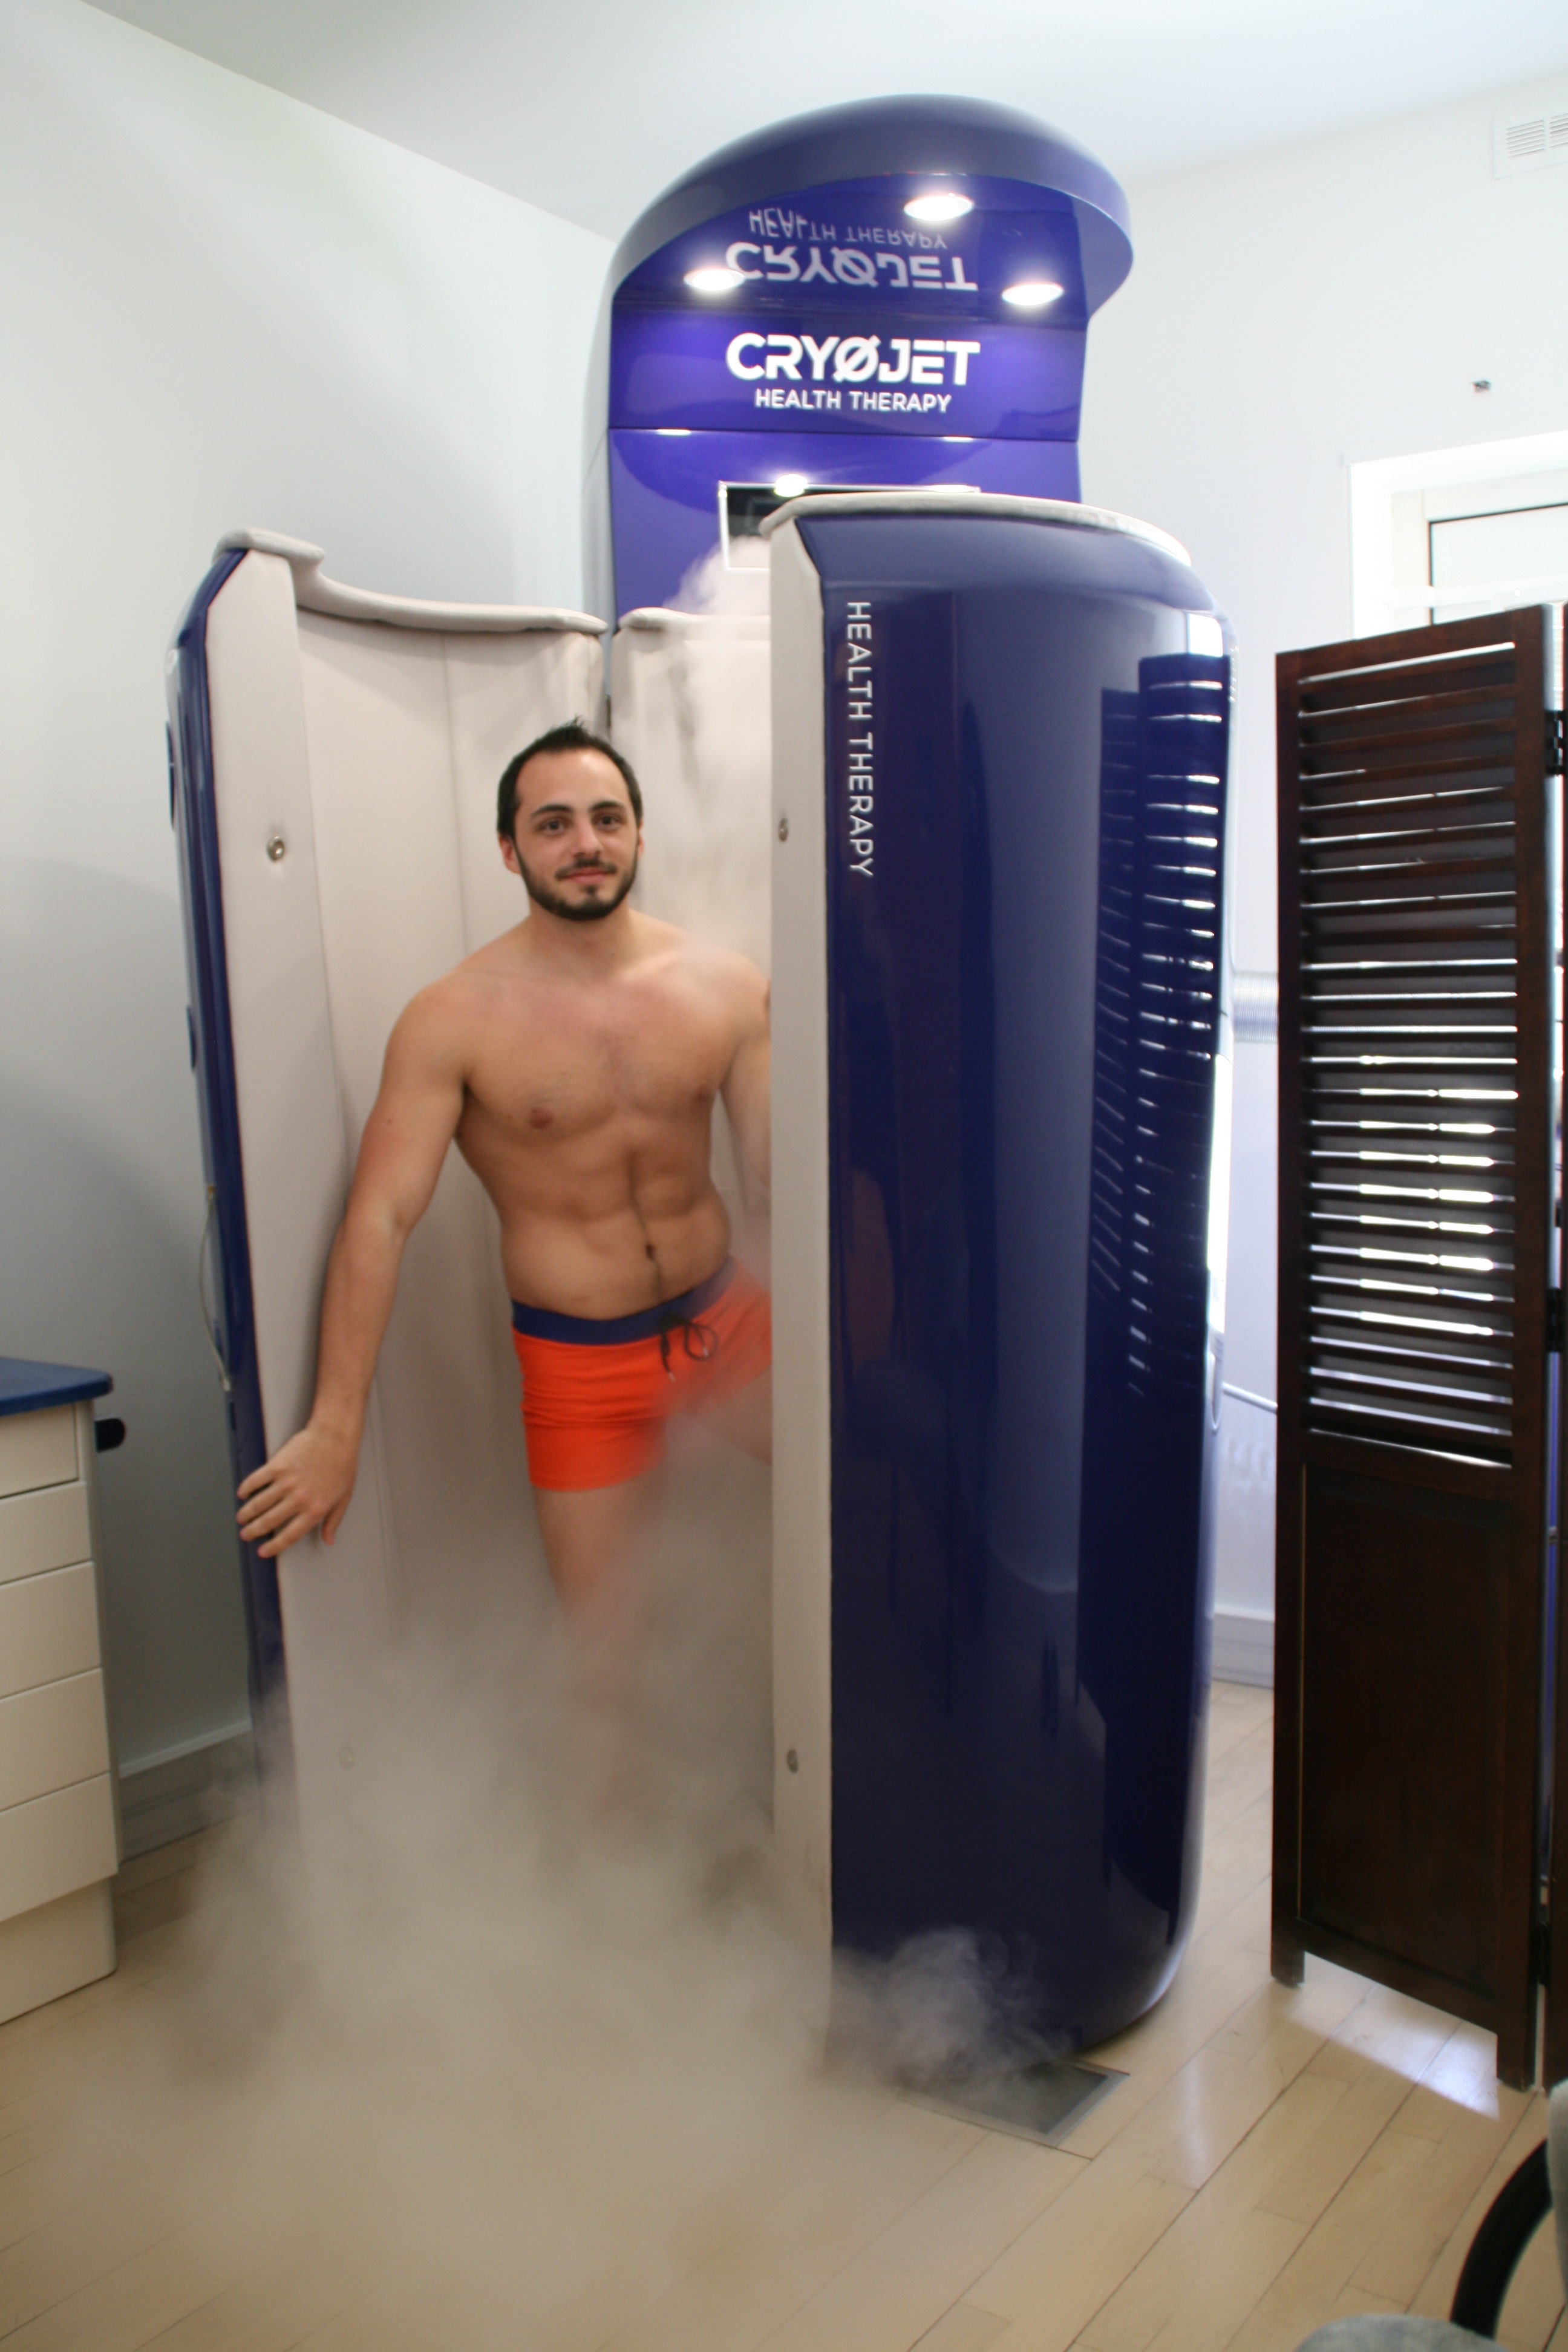 Vichy Célestins Thermal Spa Cryojet health therapy Ⓒ Vichy Célestins Thermal Spa - 2018